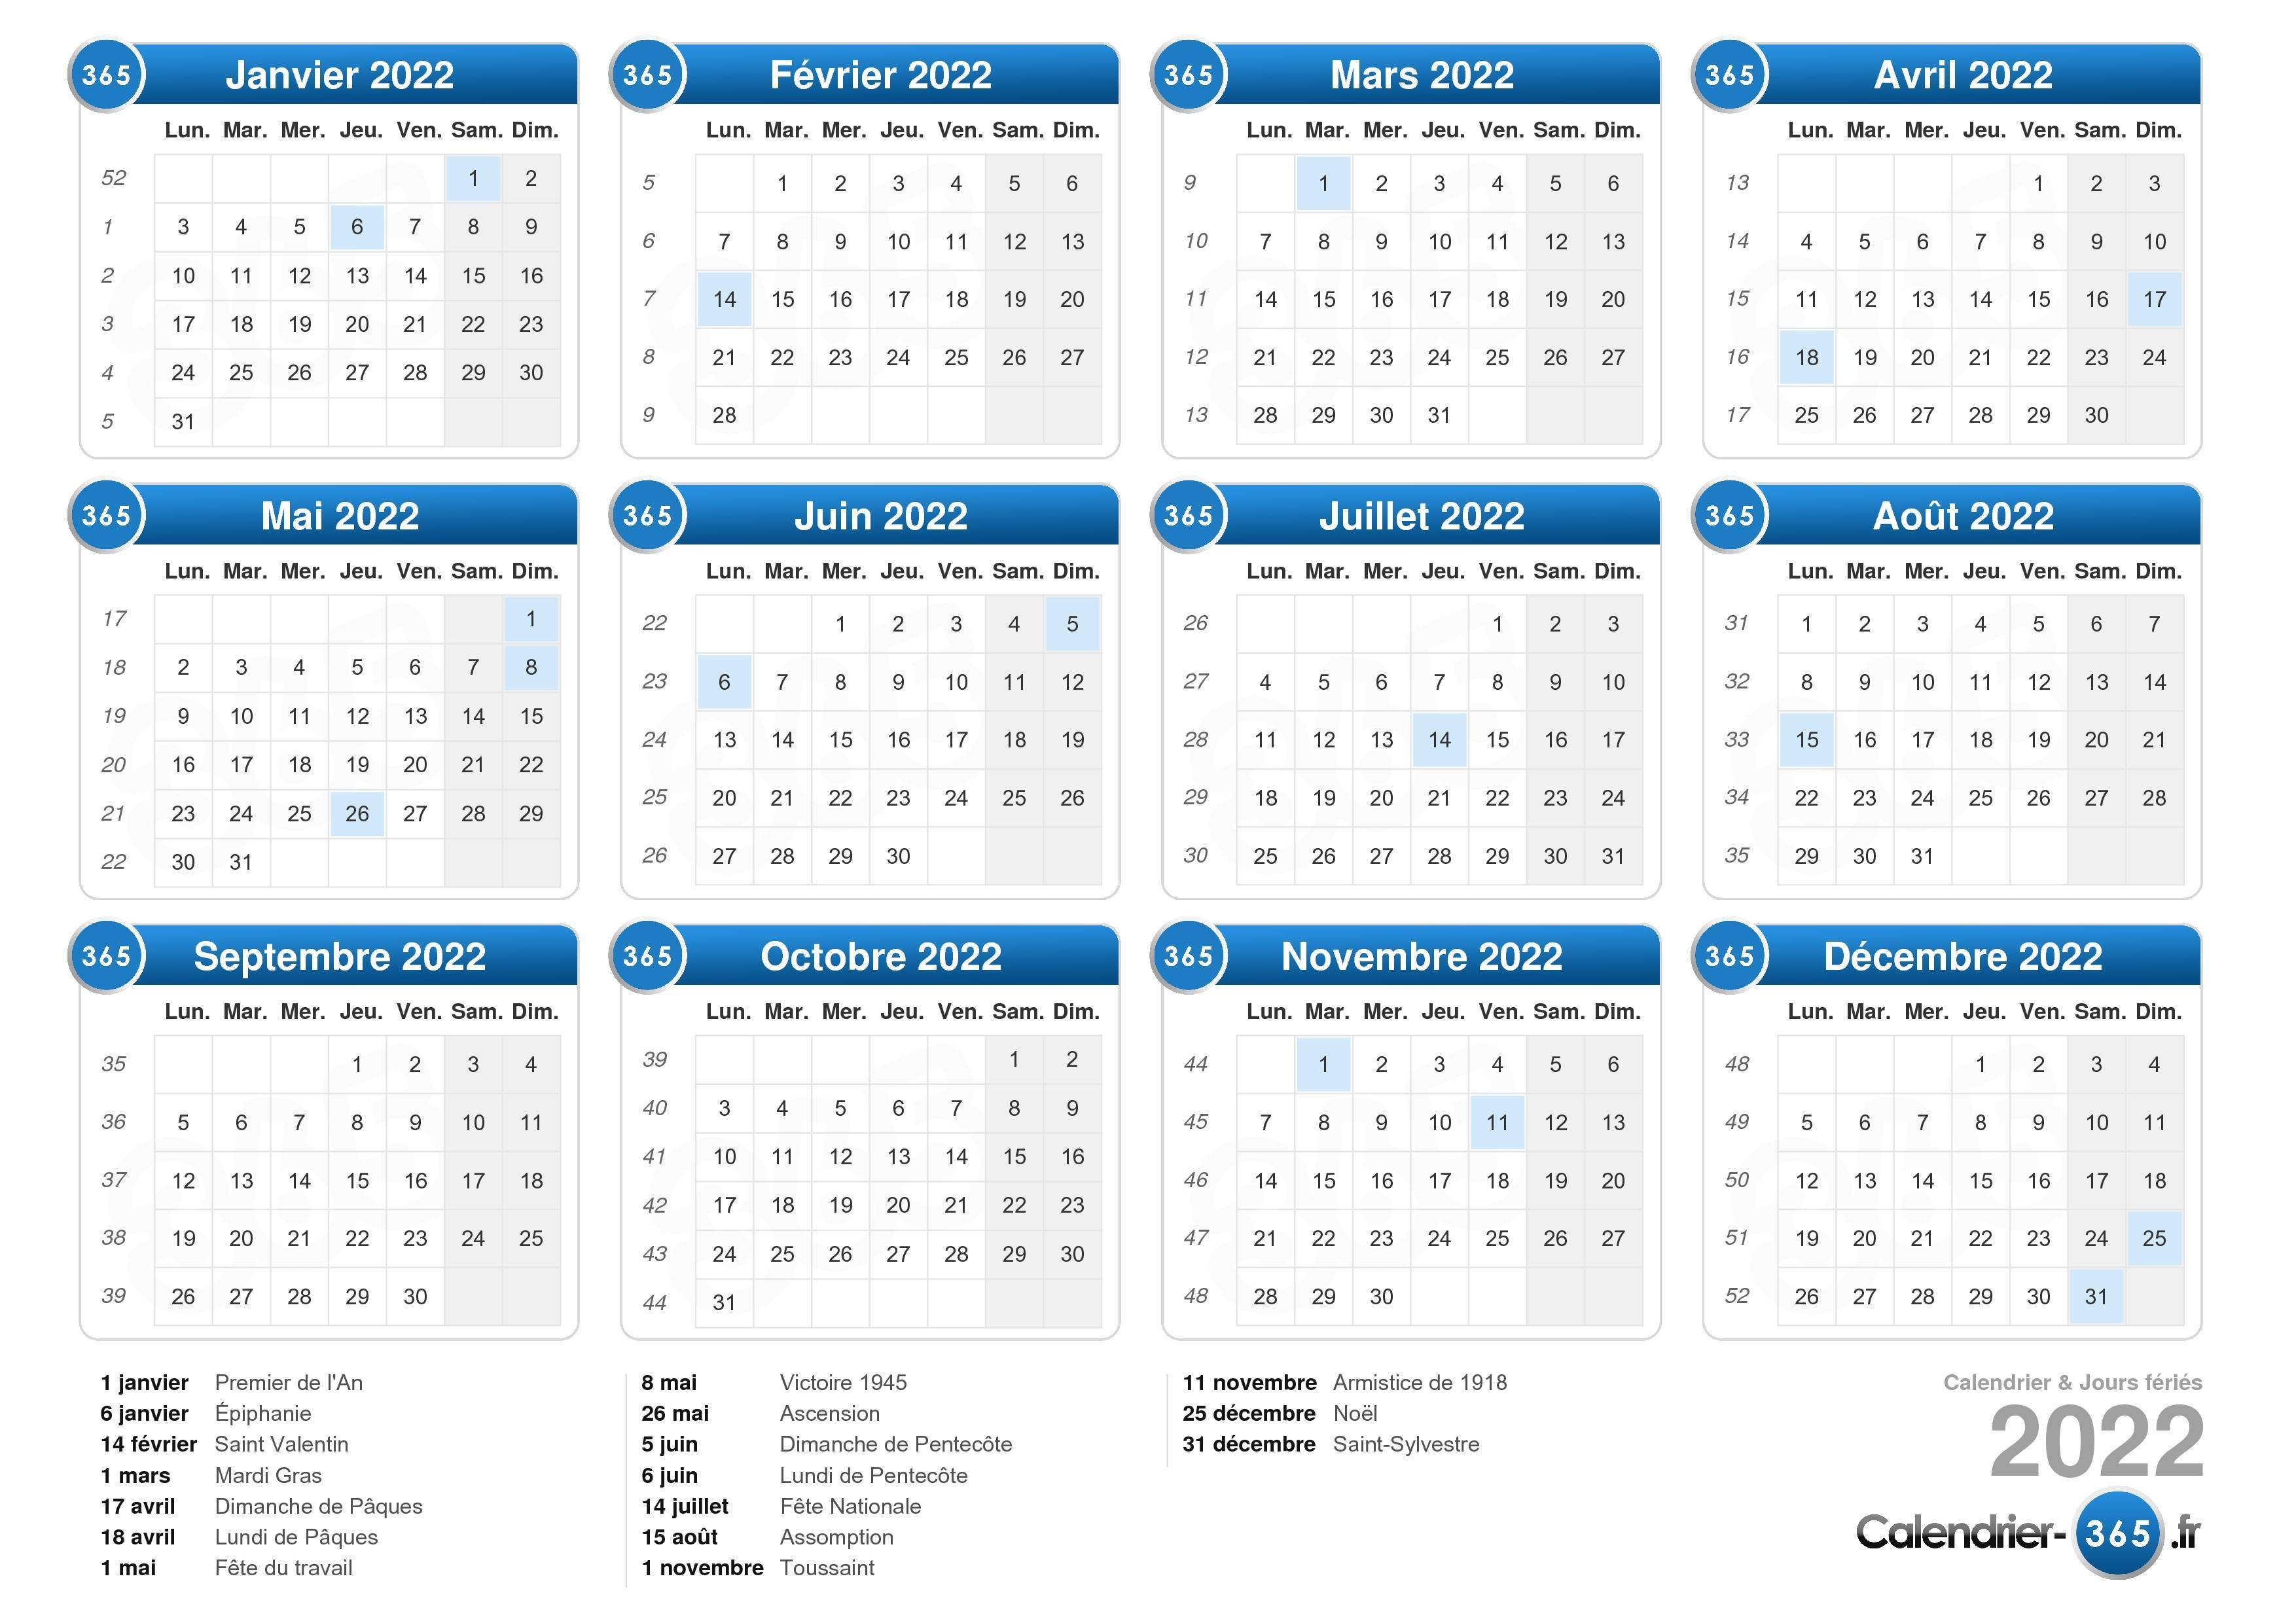 Calendrier Semaine Paire Et Impaire 2021 2022 Calendrier 2022